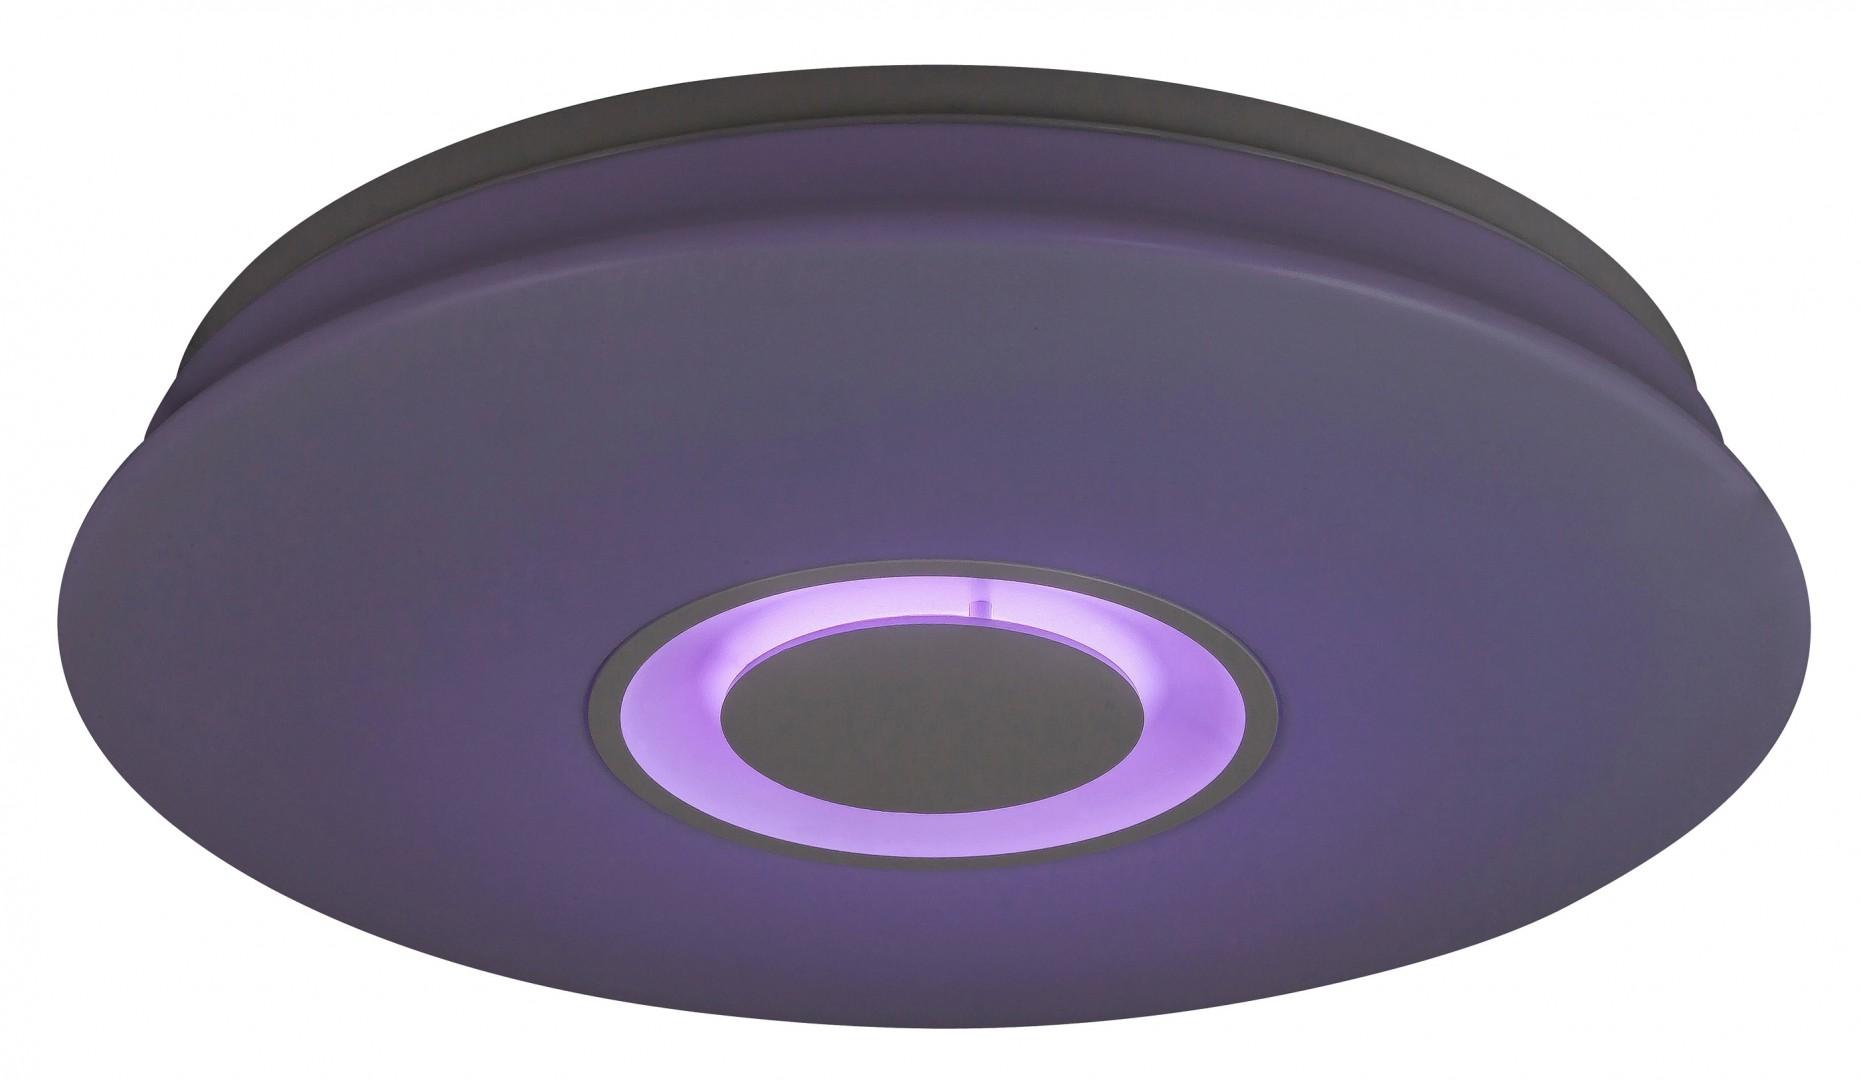 Plafoniere Led Rgb : Corpuri de iluminat plafoniera dimabila cu led rgb si tele